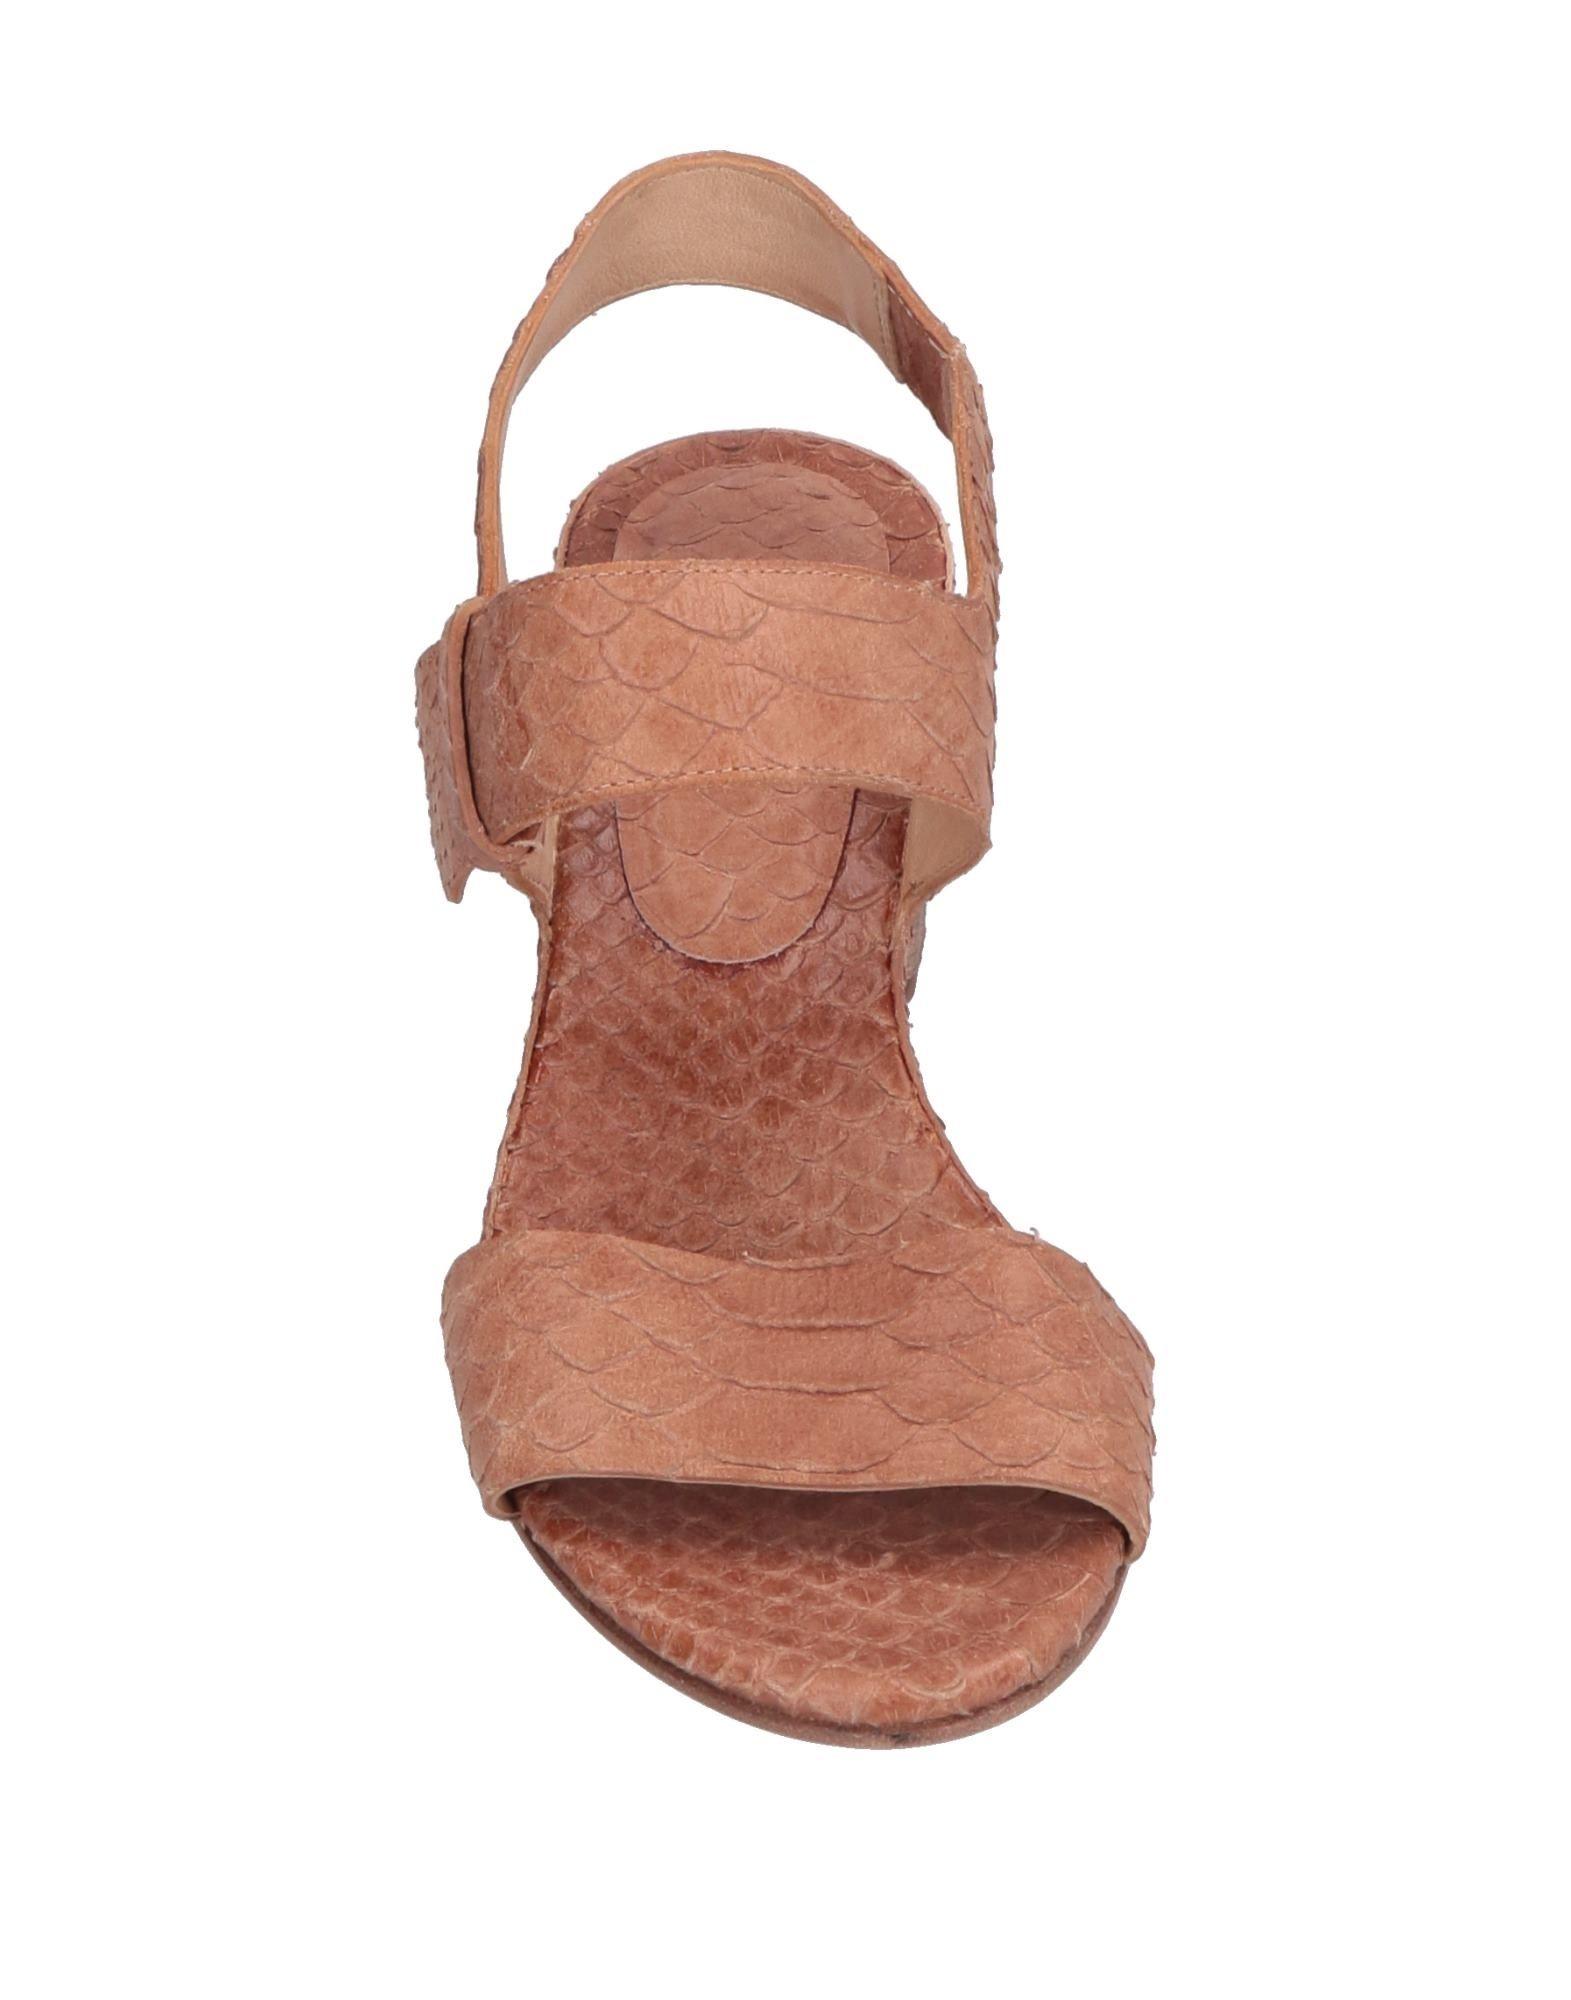 del del del carlo sandales - femmes del carlo sandales en ligne au royaume - uni - 11584035lc 0ef182